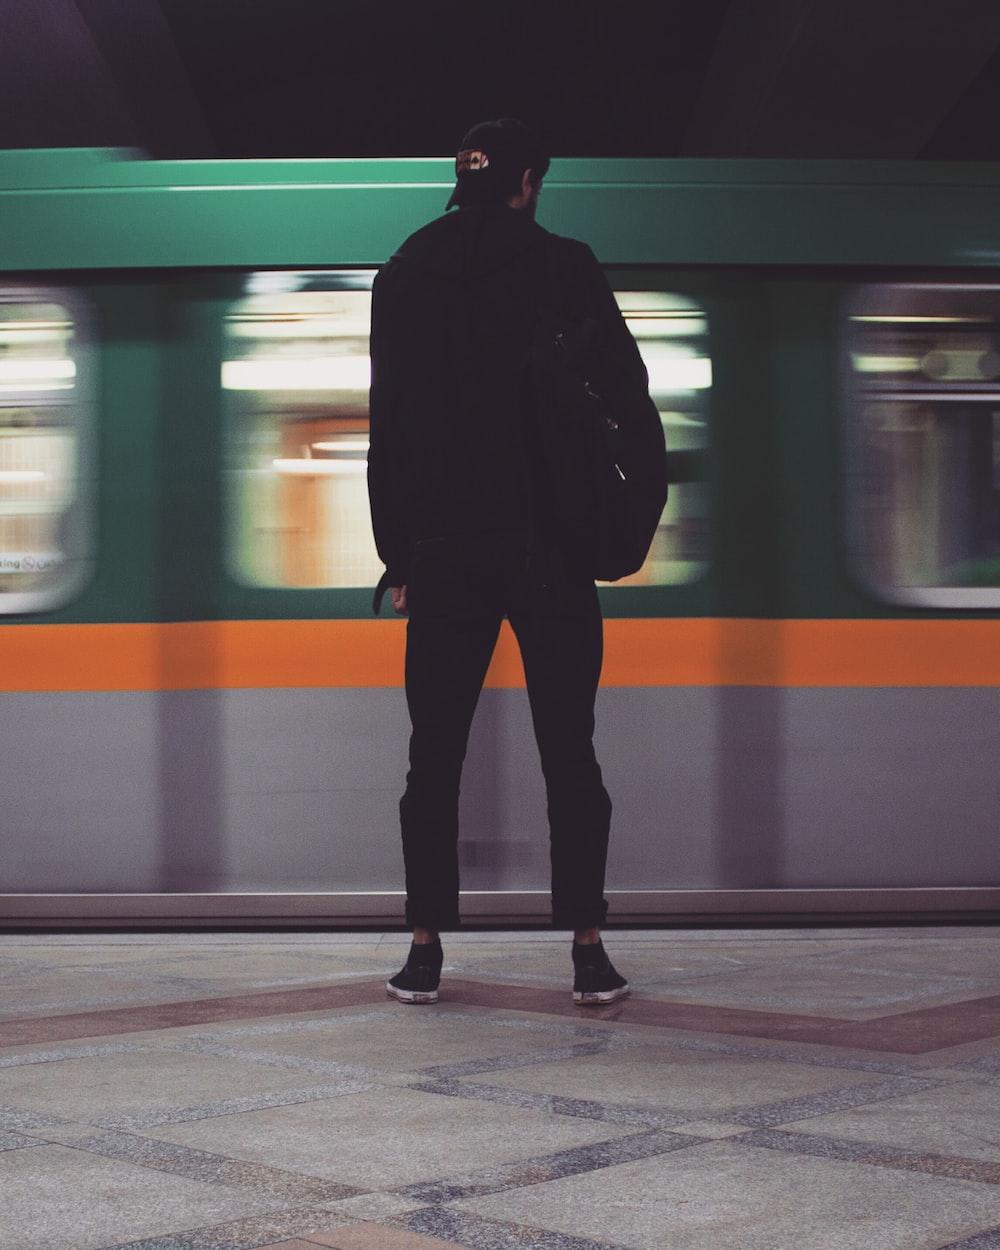 man in black jacket standing beside train